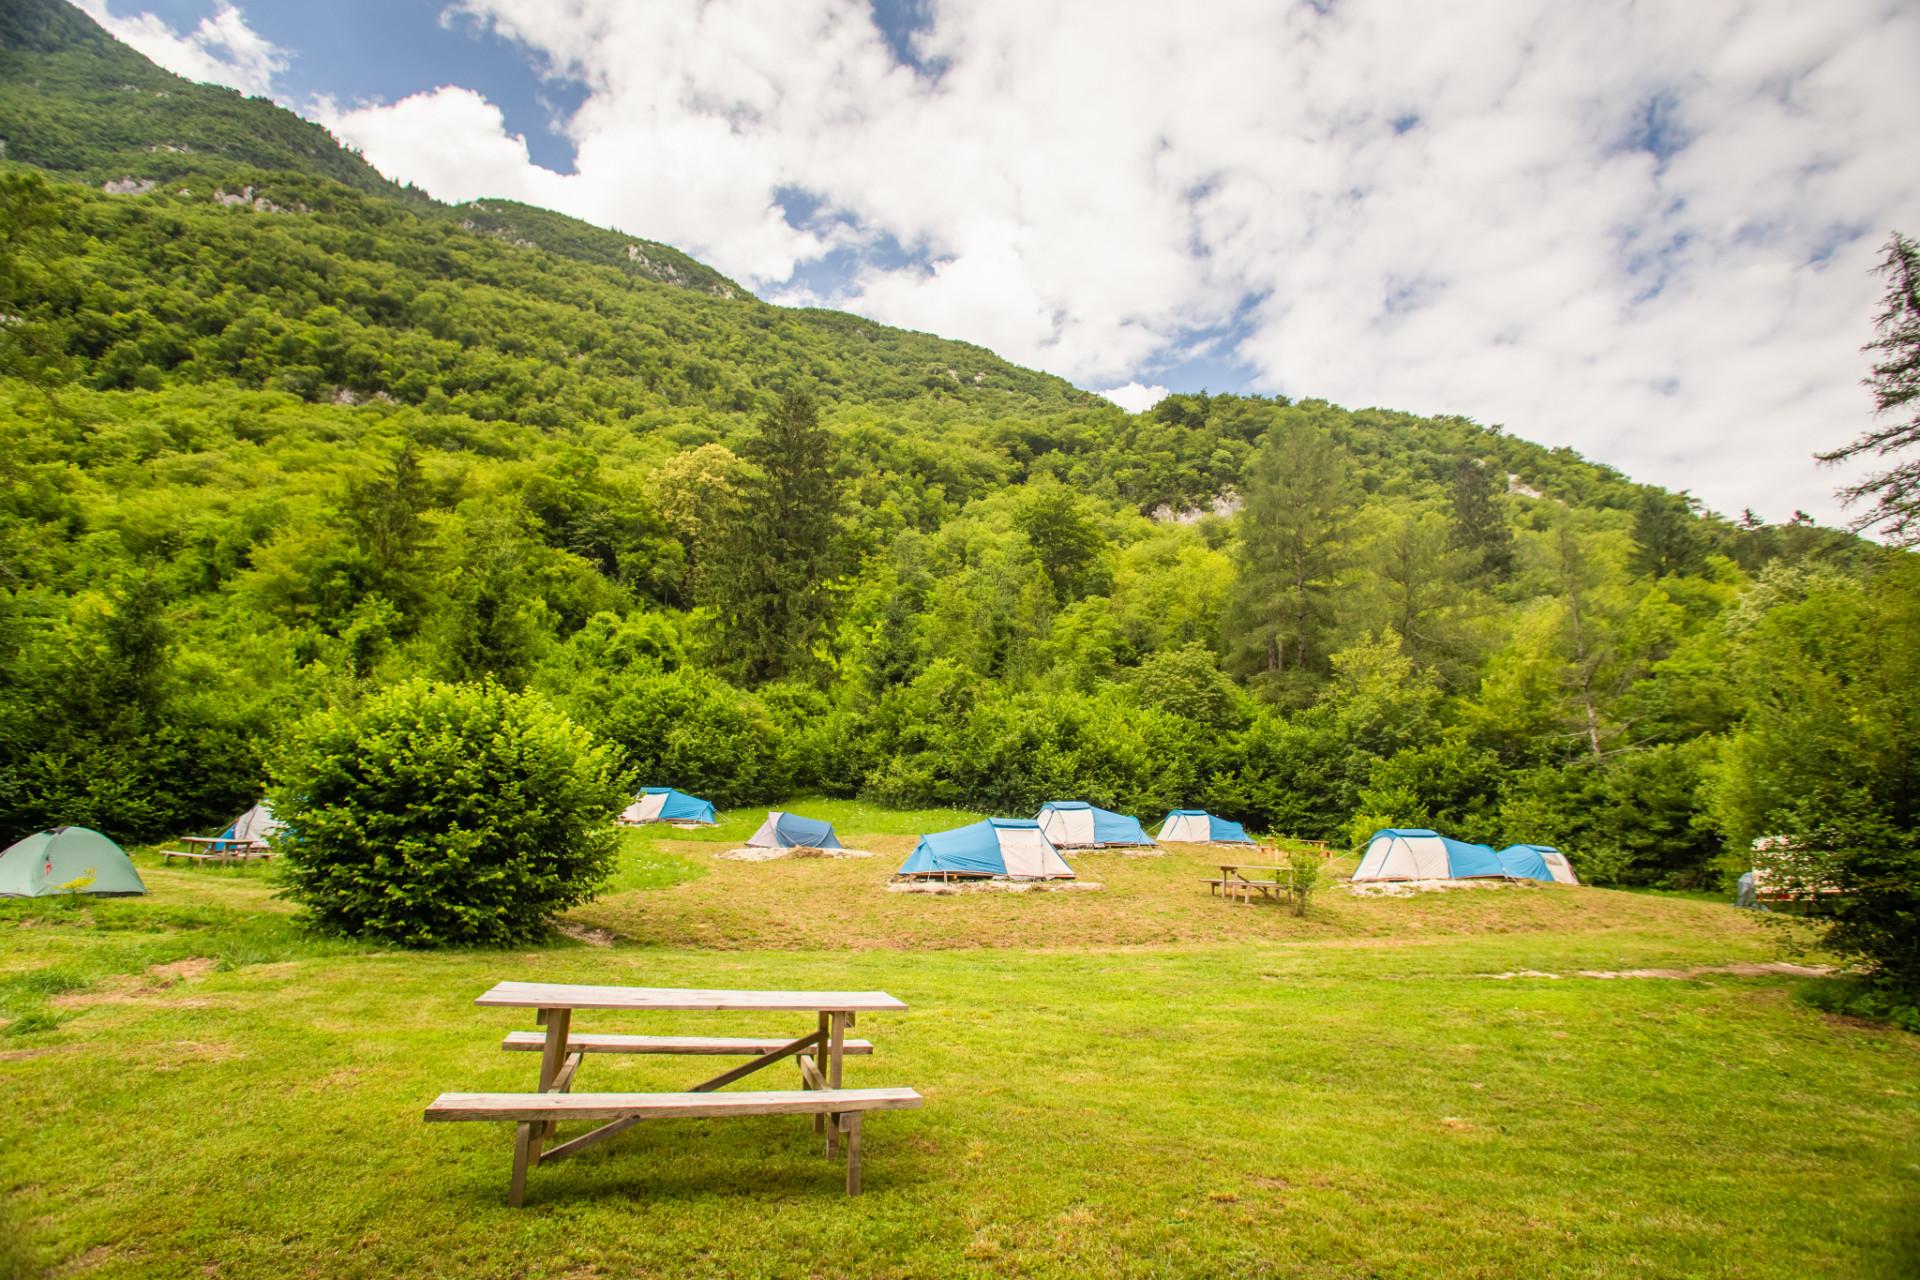 Camping in Slowenien - Eco camp Resort